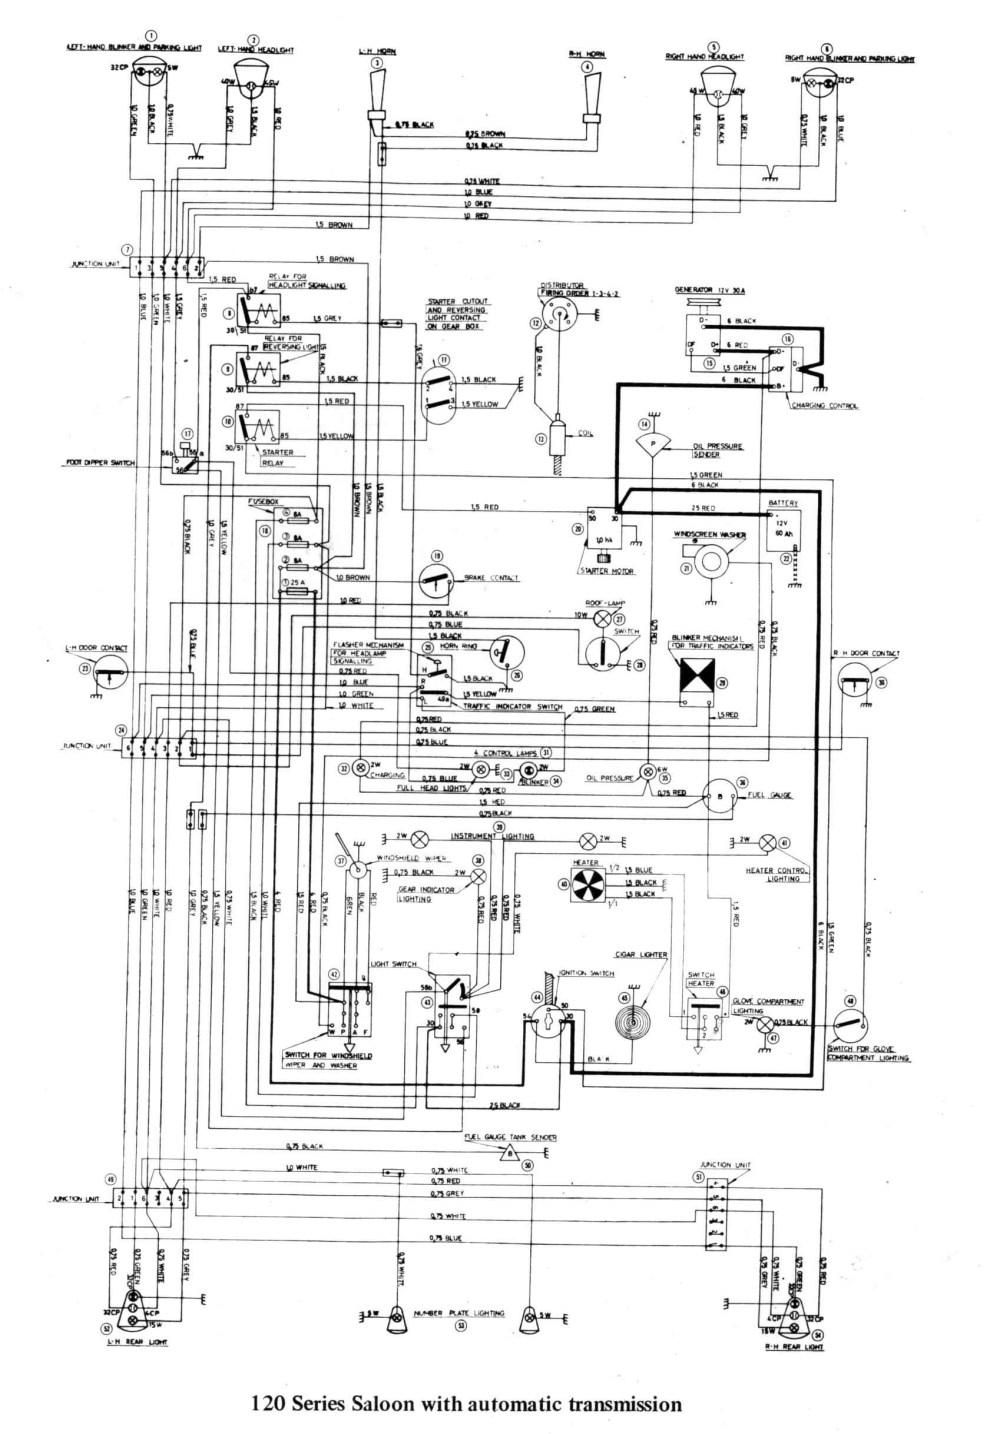 medium resolution of yamaha golf cart battery wiring diagram wiring diagrams for yamaha golf carts valid ezgo wiring